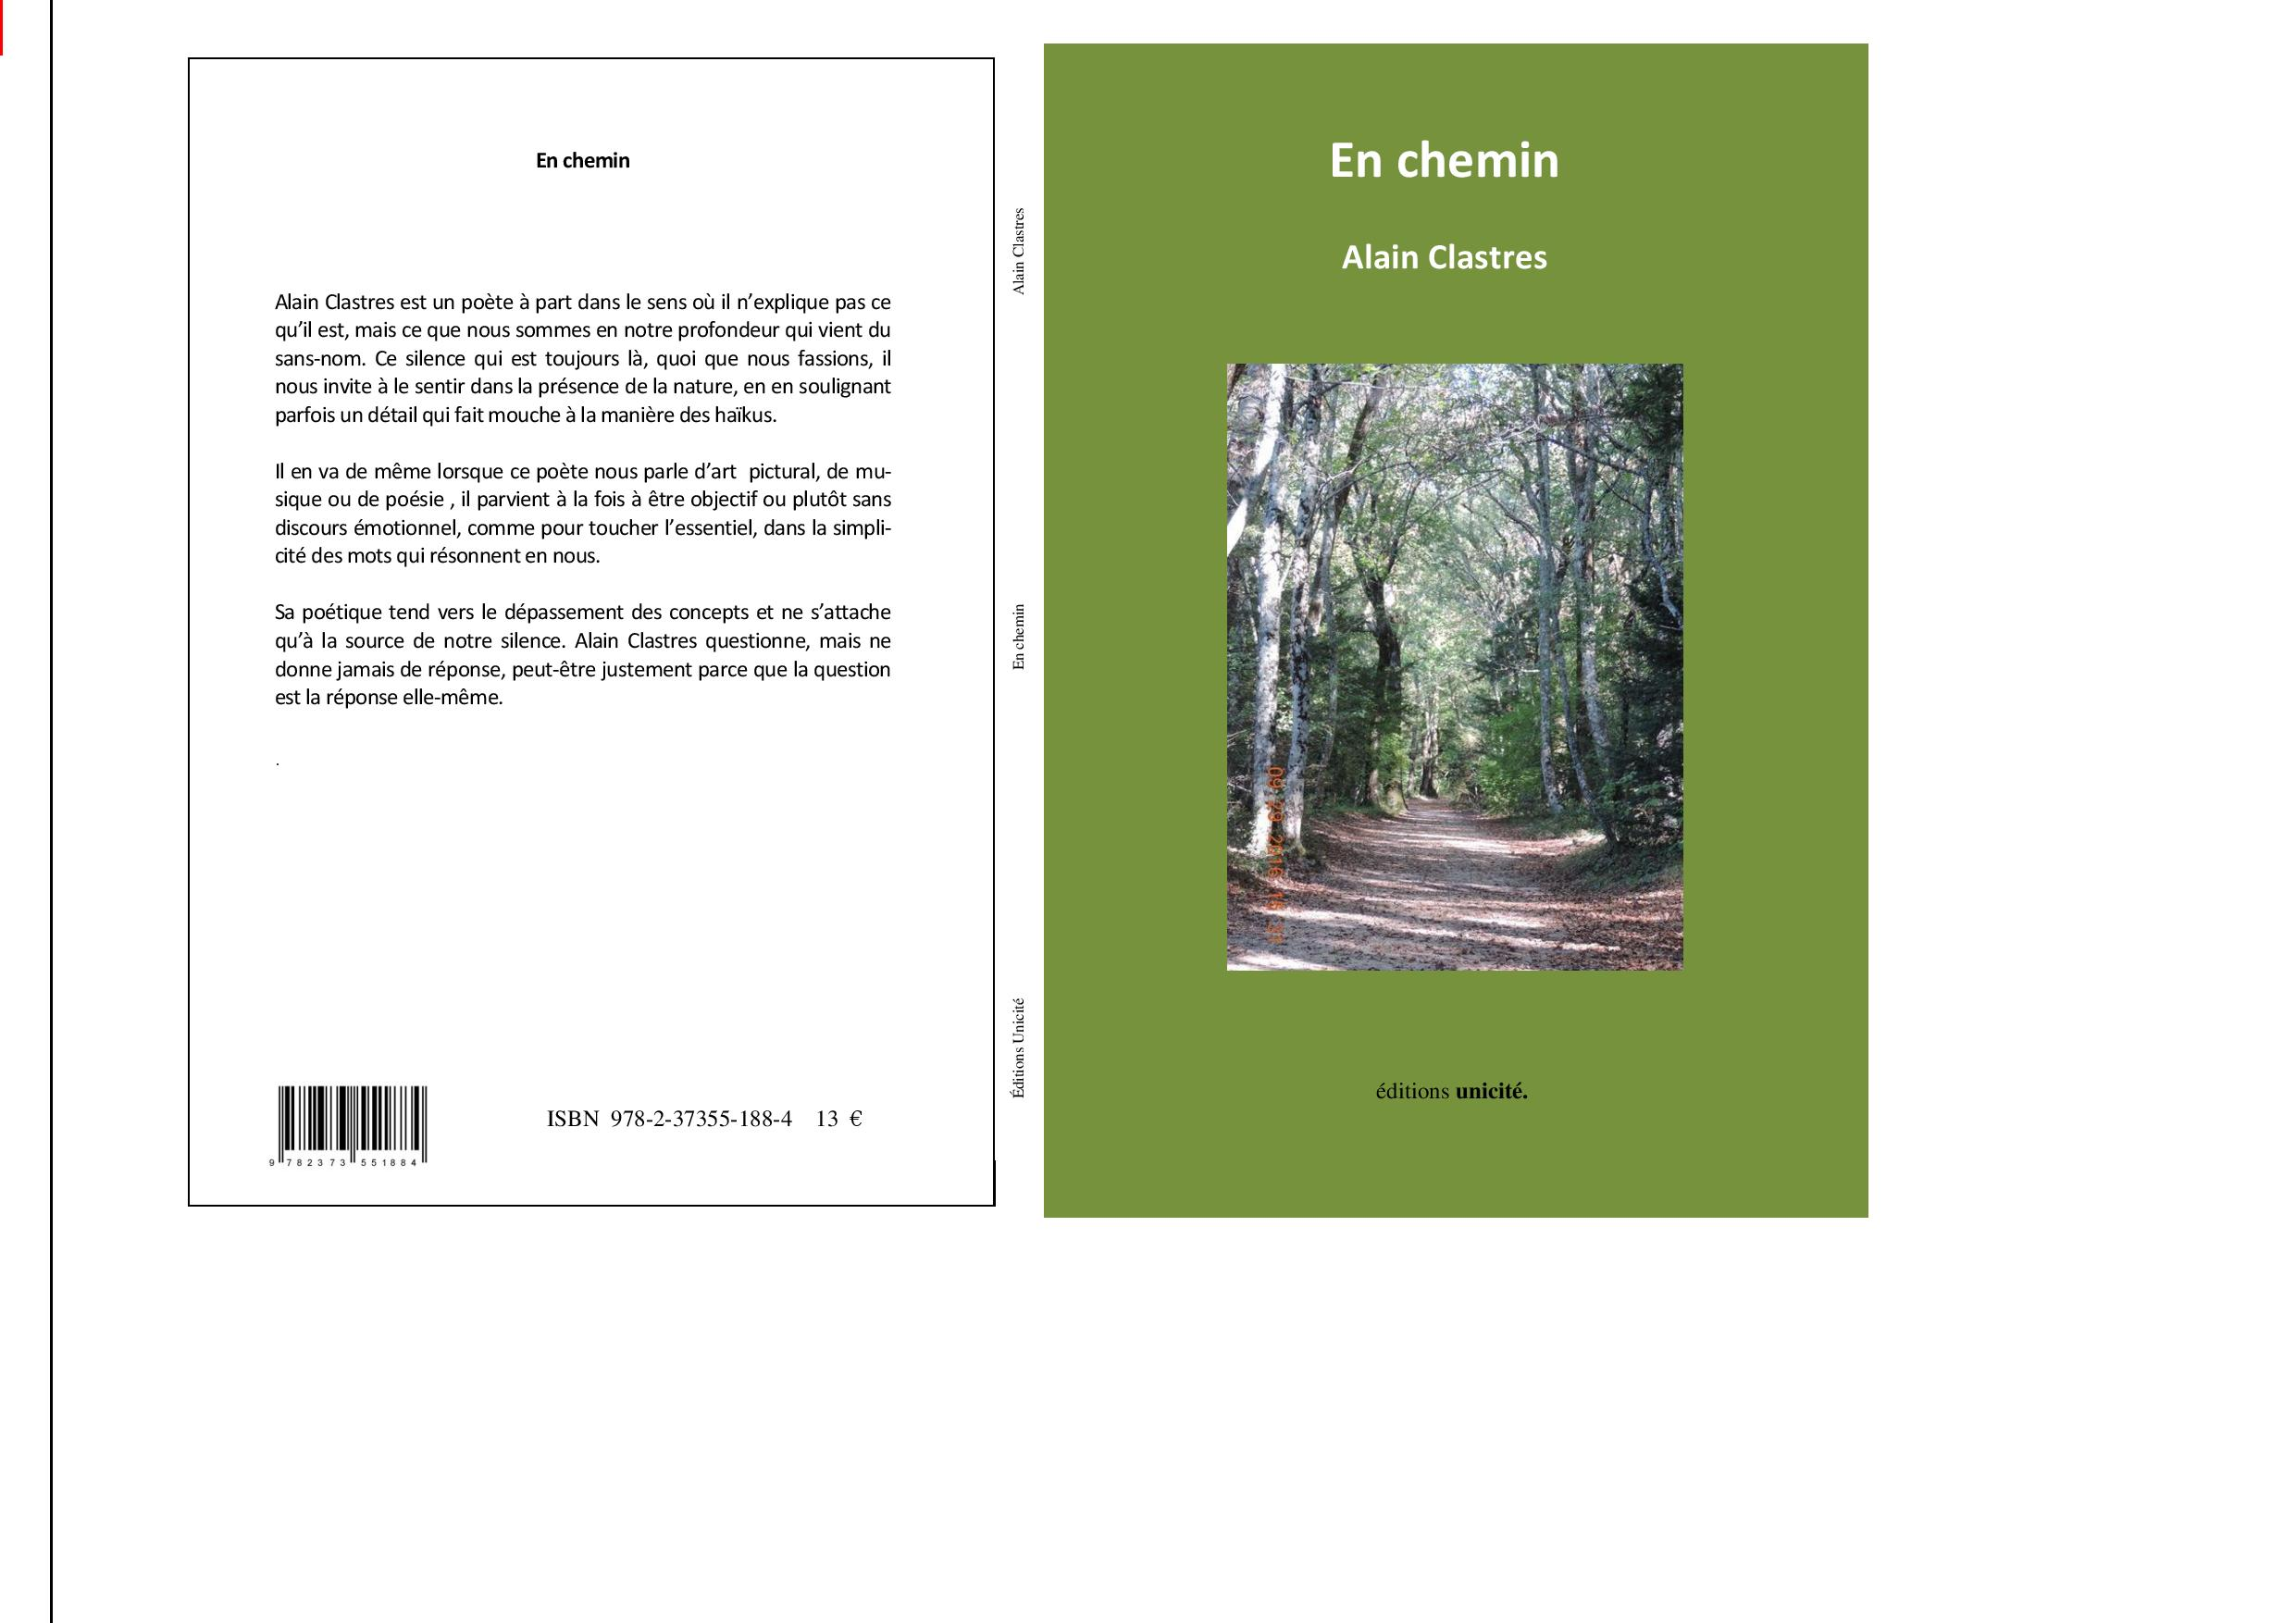 cou1ok Clastre Copie - Copie - Copie (2)-page-001.jpg